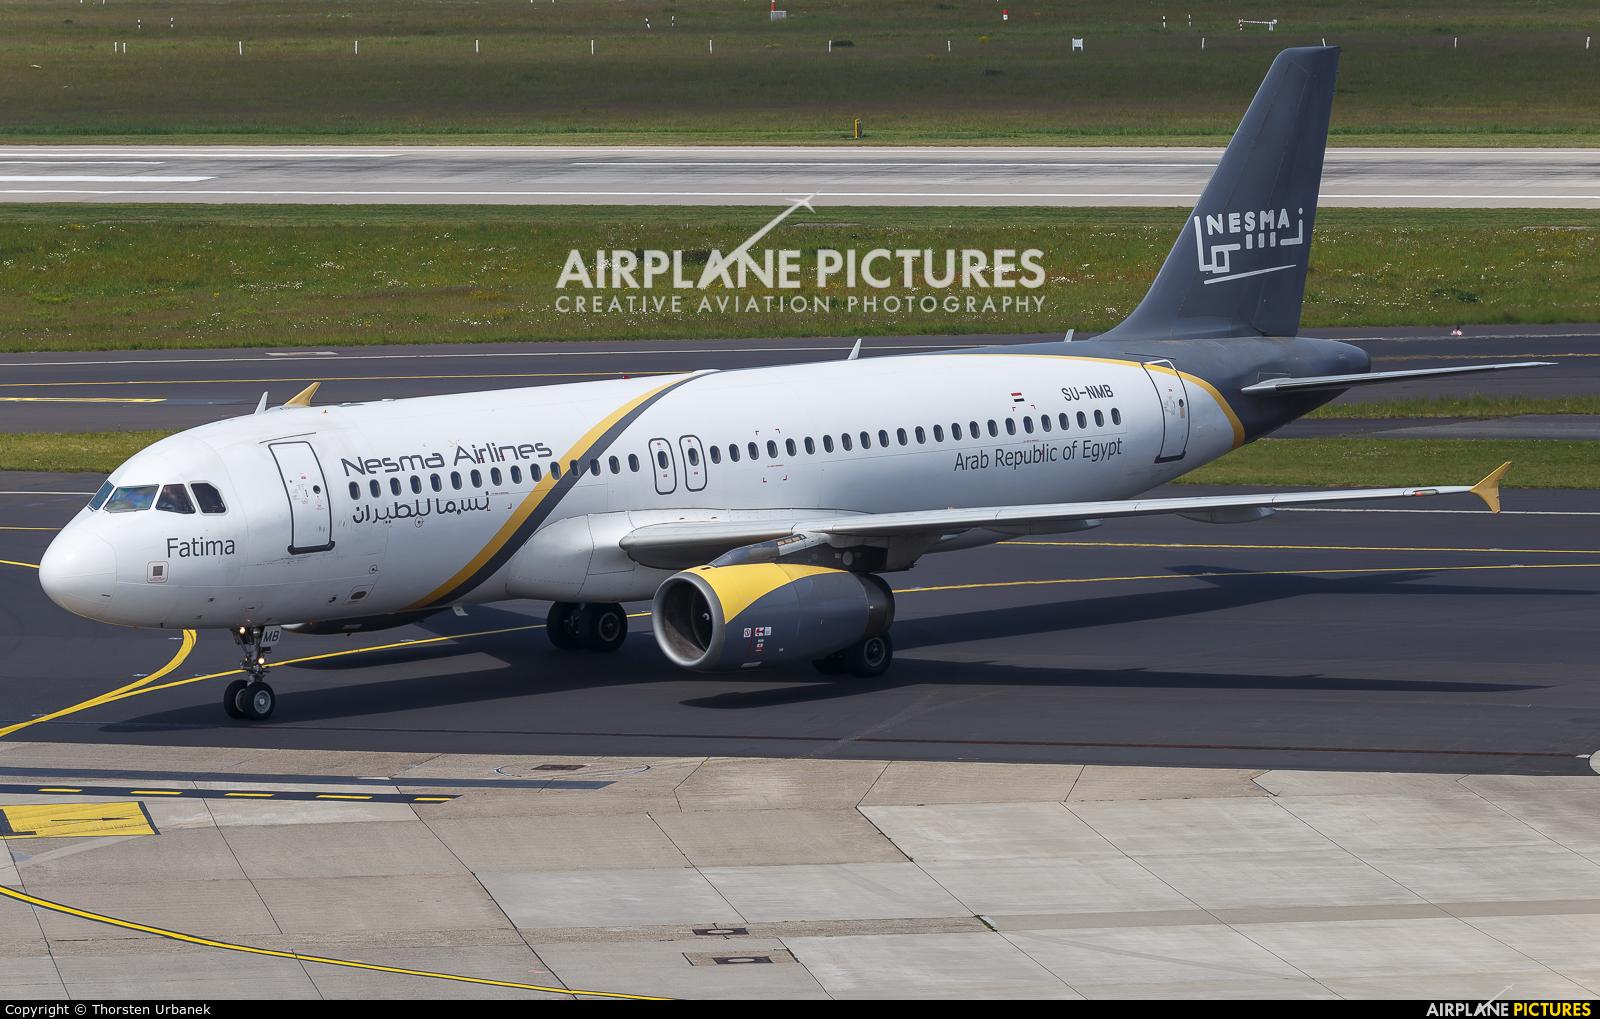 Nesma Airlines SU-NMB aircraft at Düsseldorf